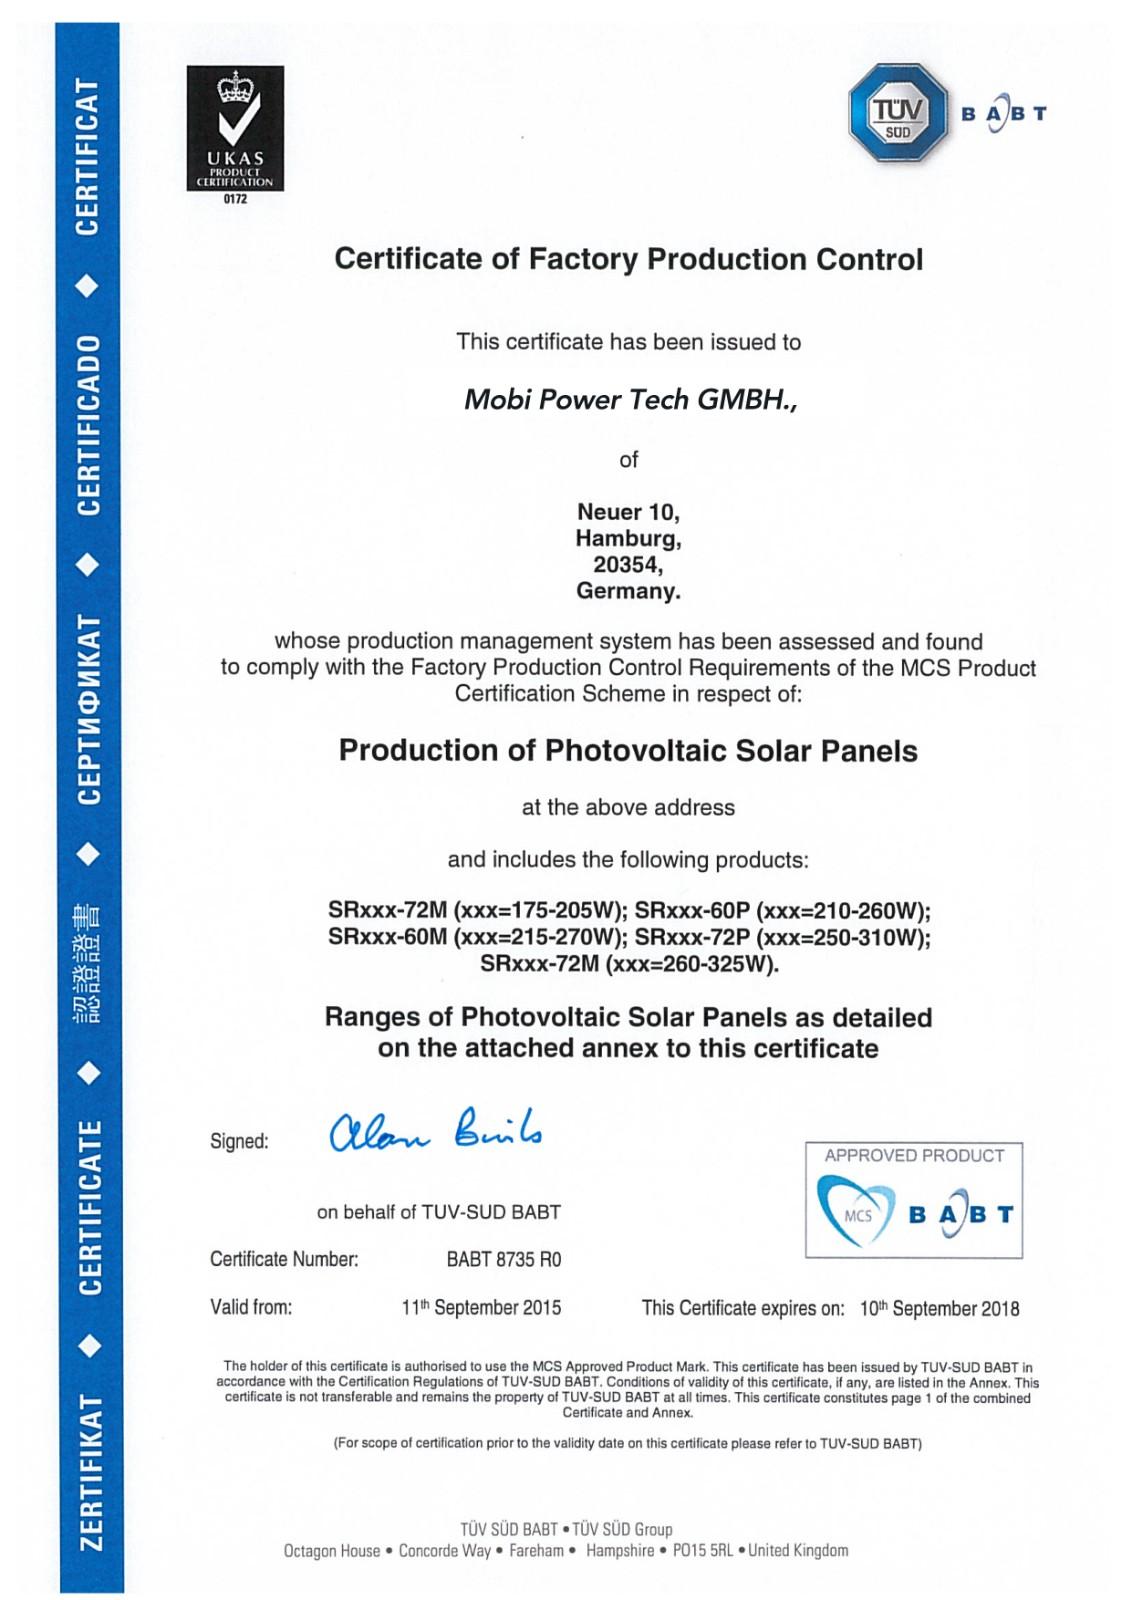 german_certification